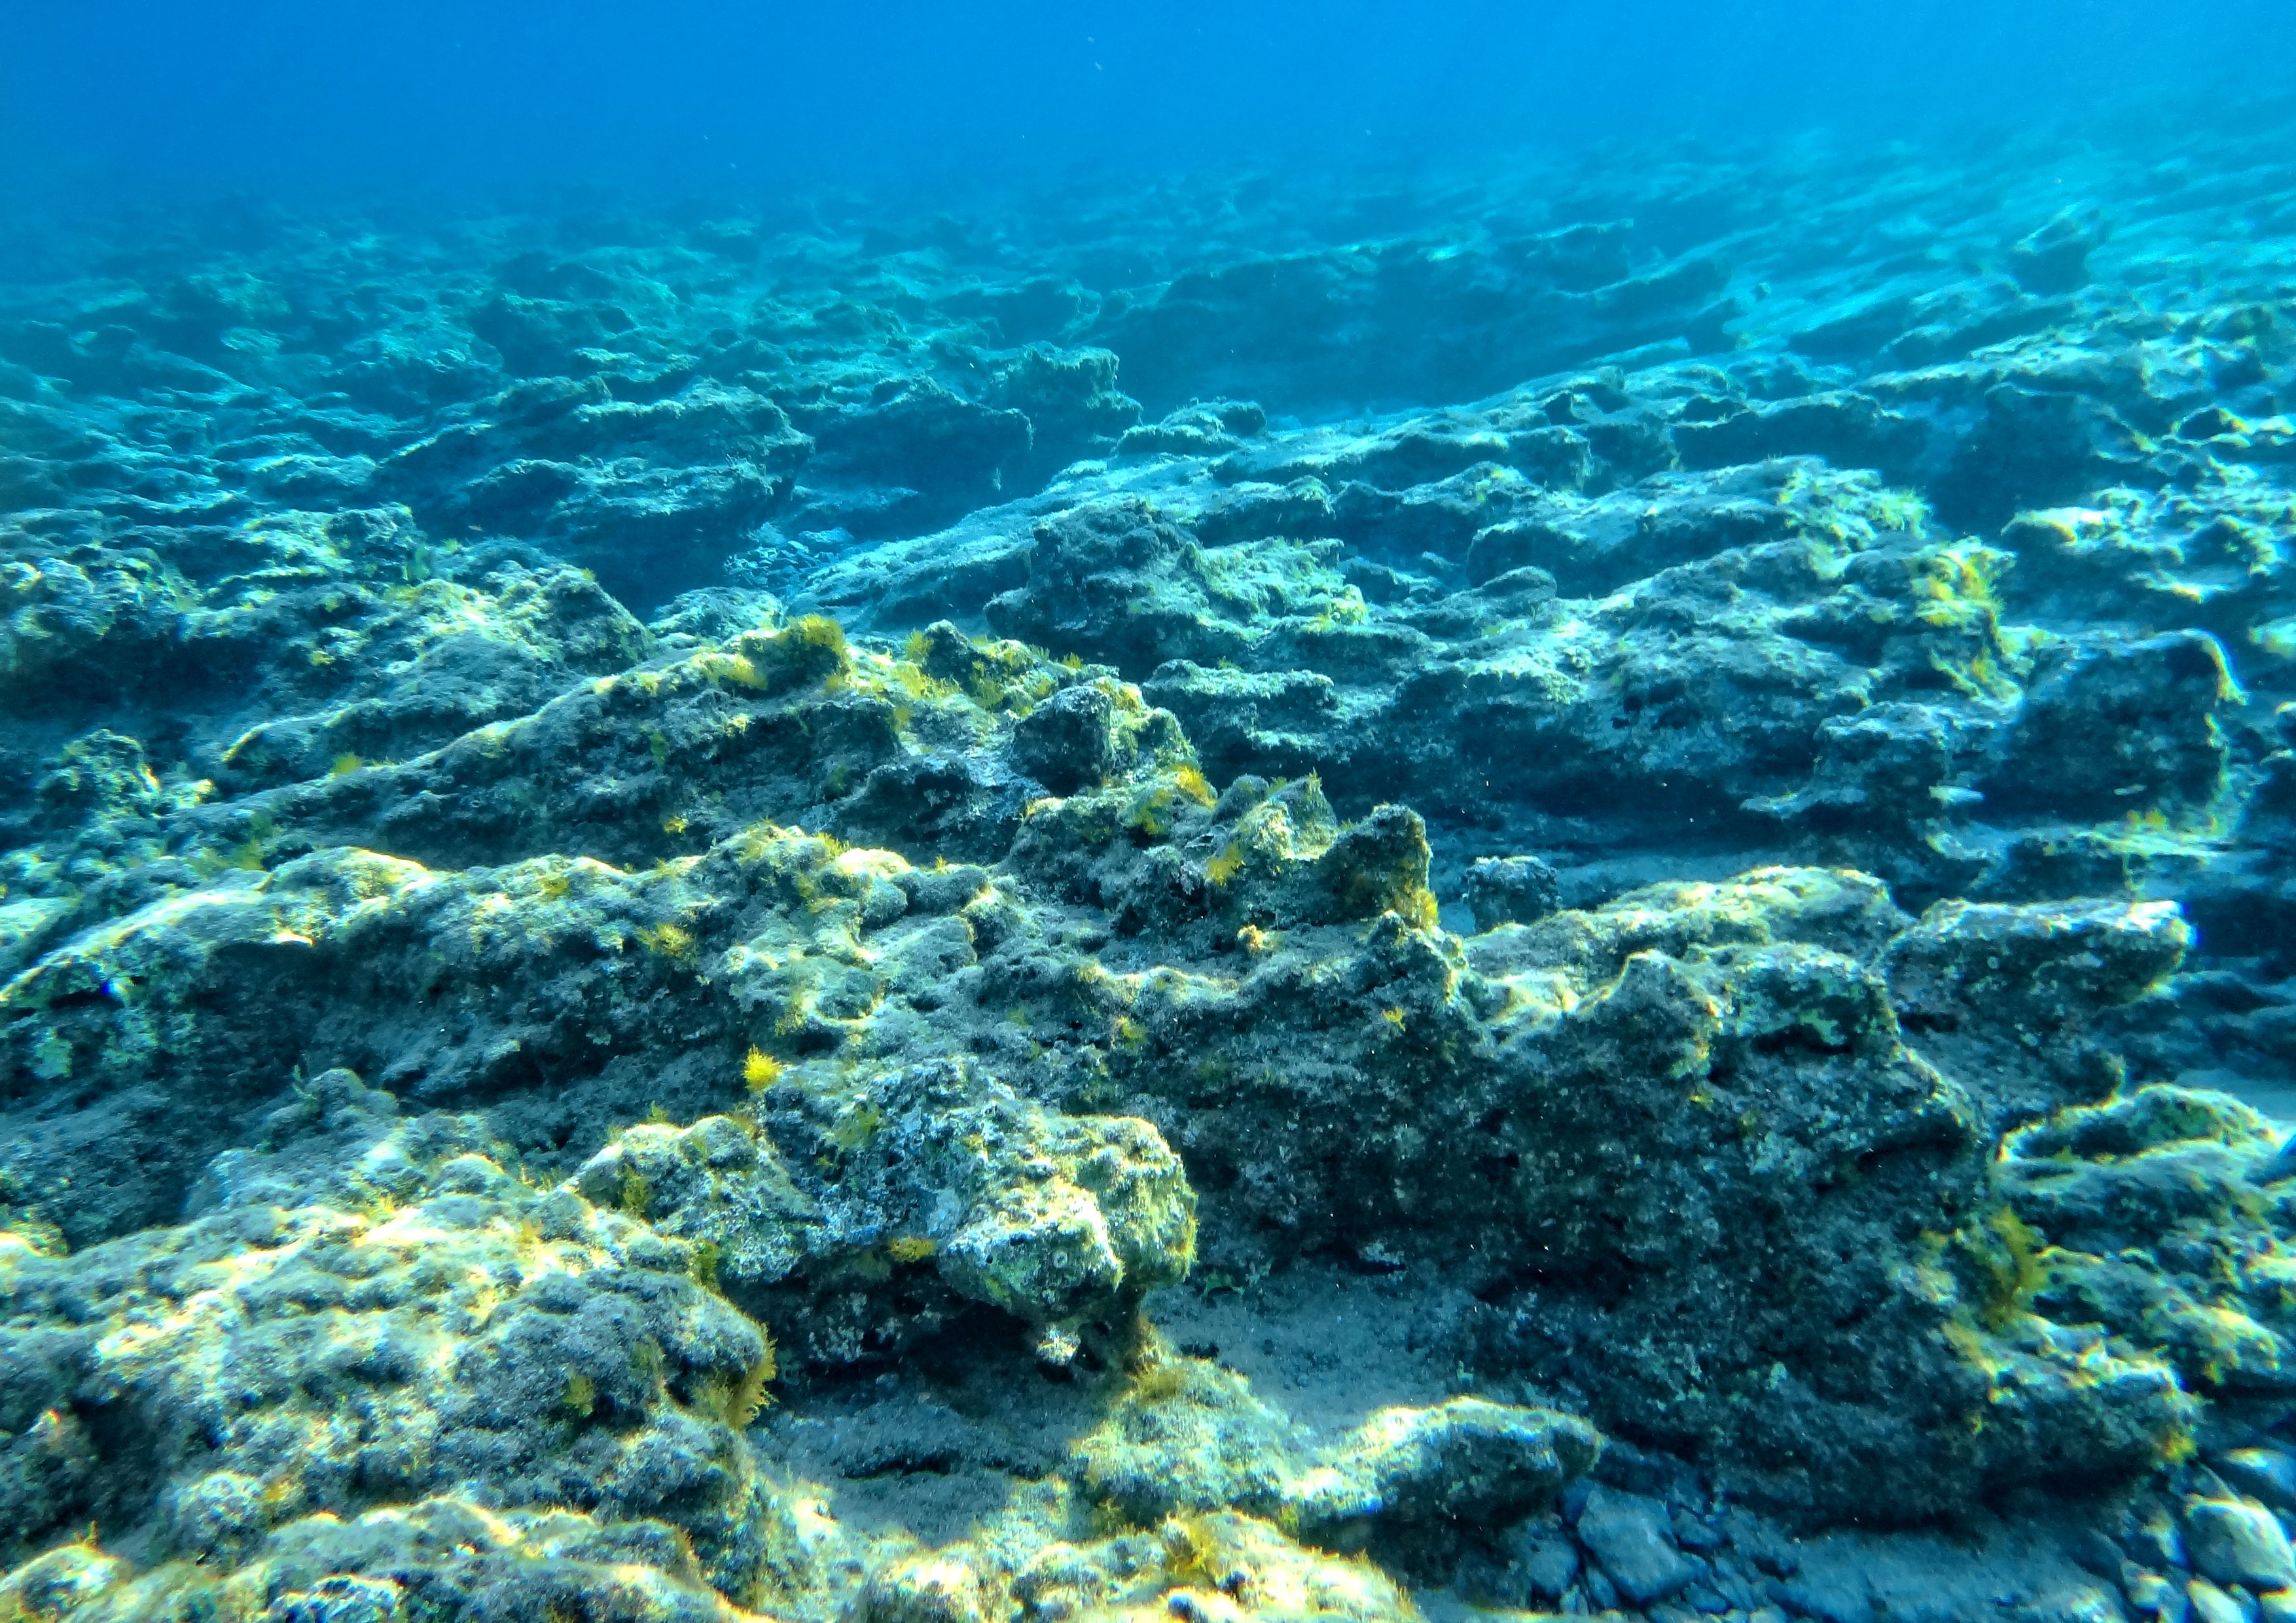 Underwater Print Diver Gift Deepwater Sea Underwater Landscape Printable Art Blue Wall Art Underwater Photography Turquoise Water Art Underwater Photography Blue Wall Art Ocean Pictures